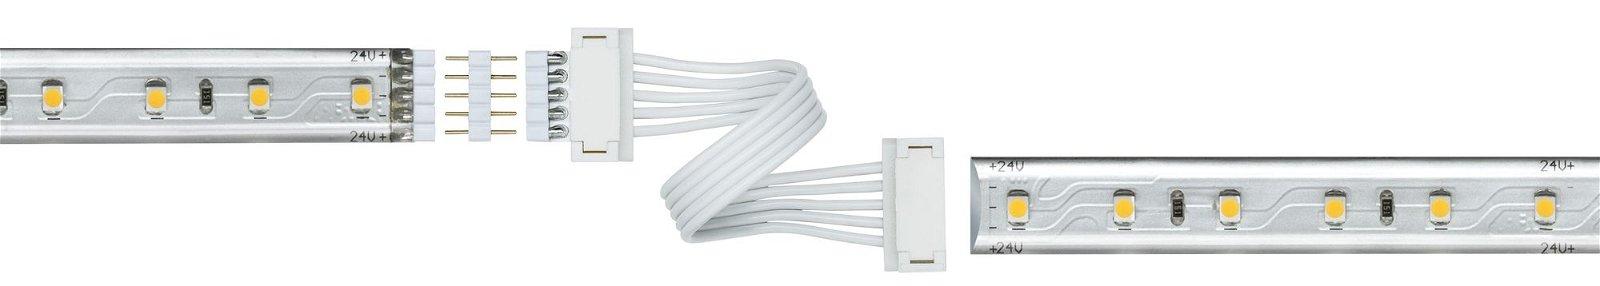 MaxLED Connecteur Universal 100x19mm max. 144W Blanc